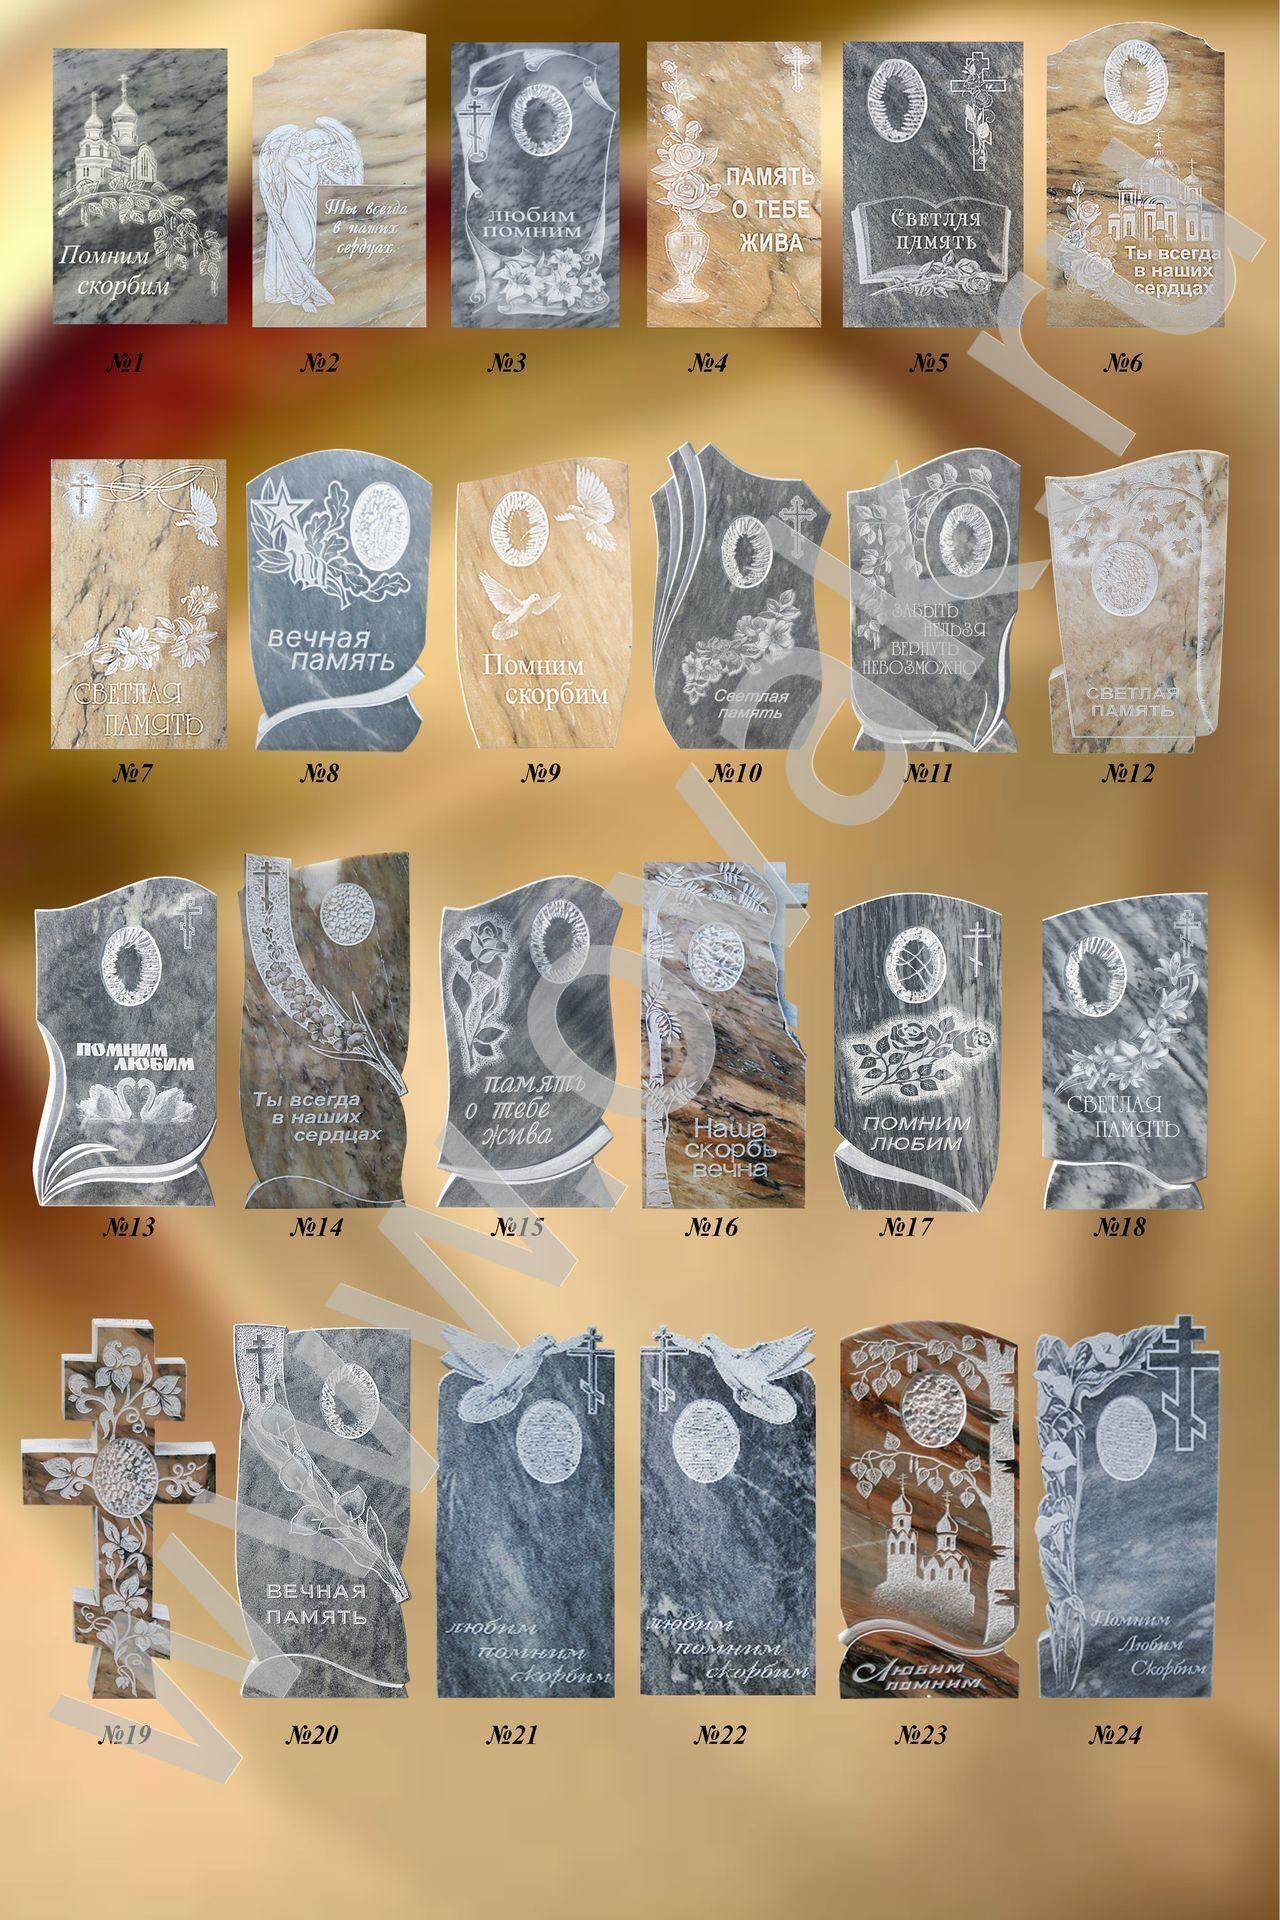 Цена на памятники новосибирска без посредников памятник недорого цена фото 2018